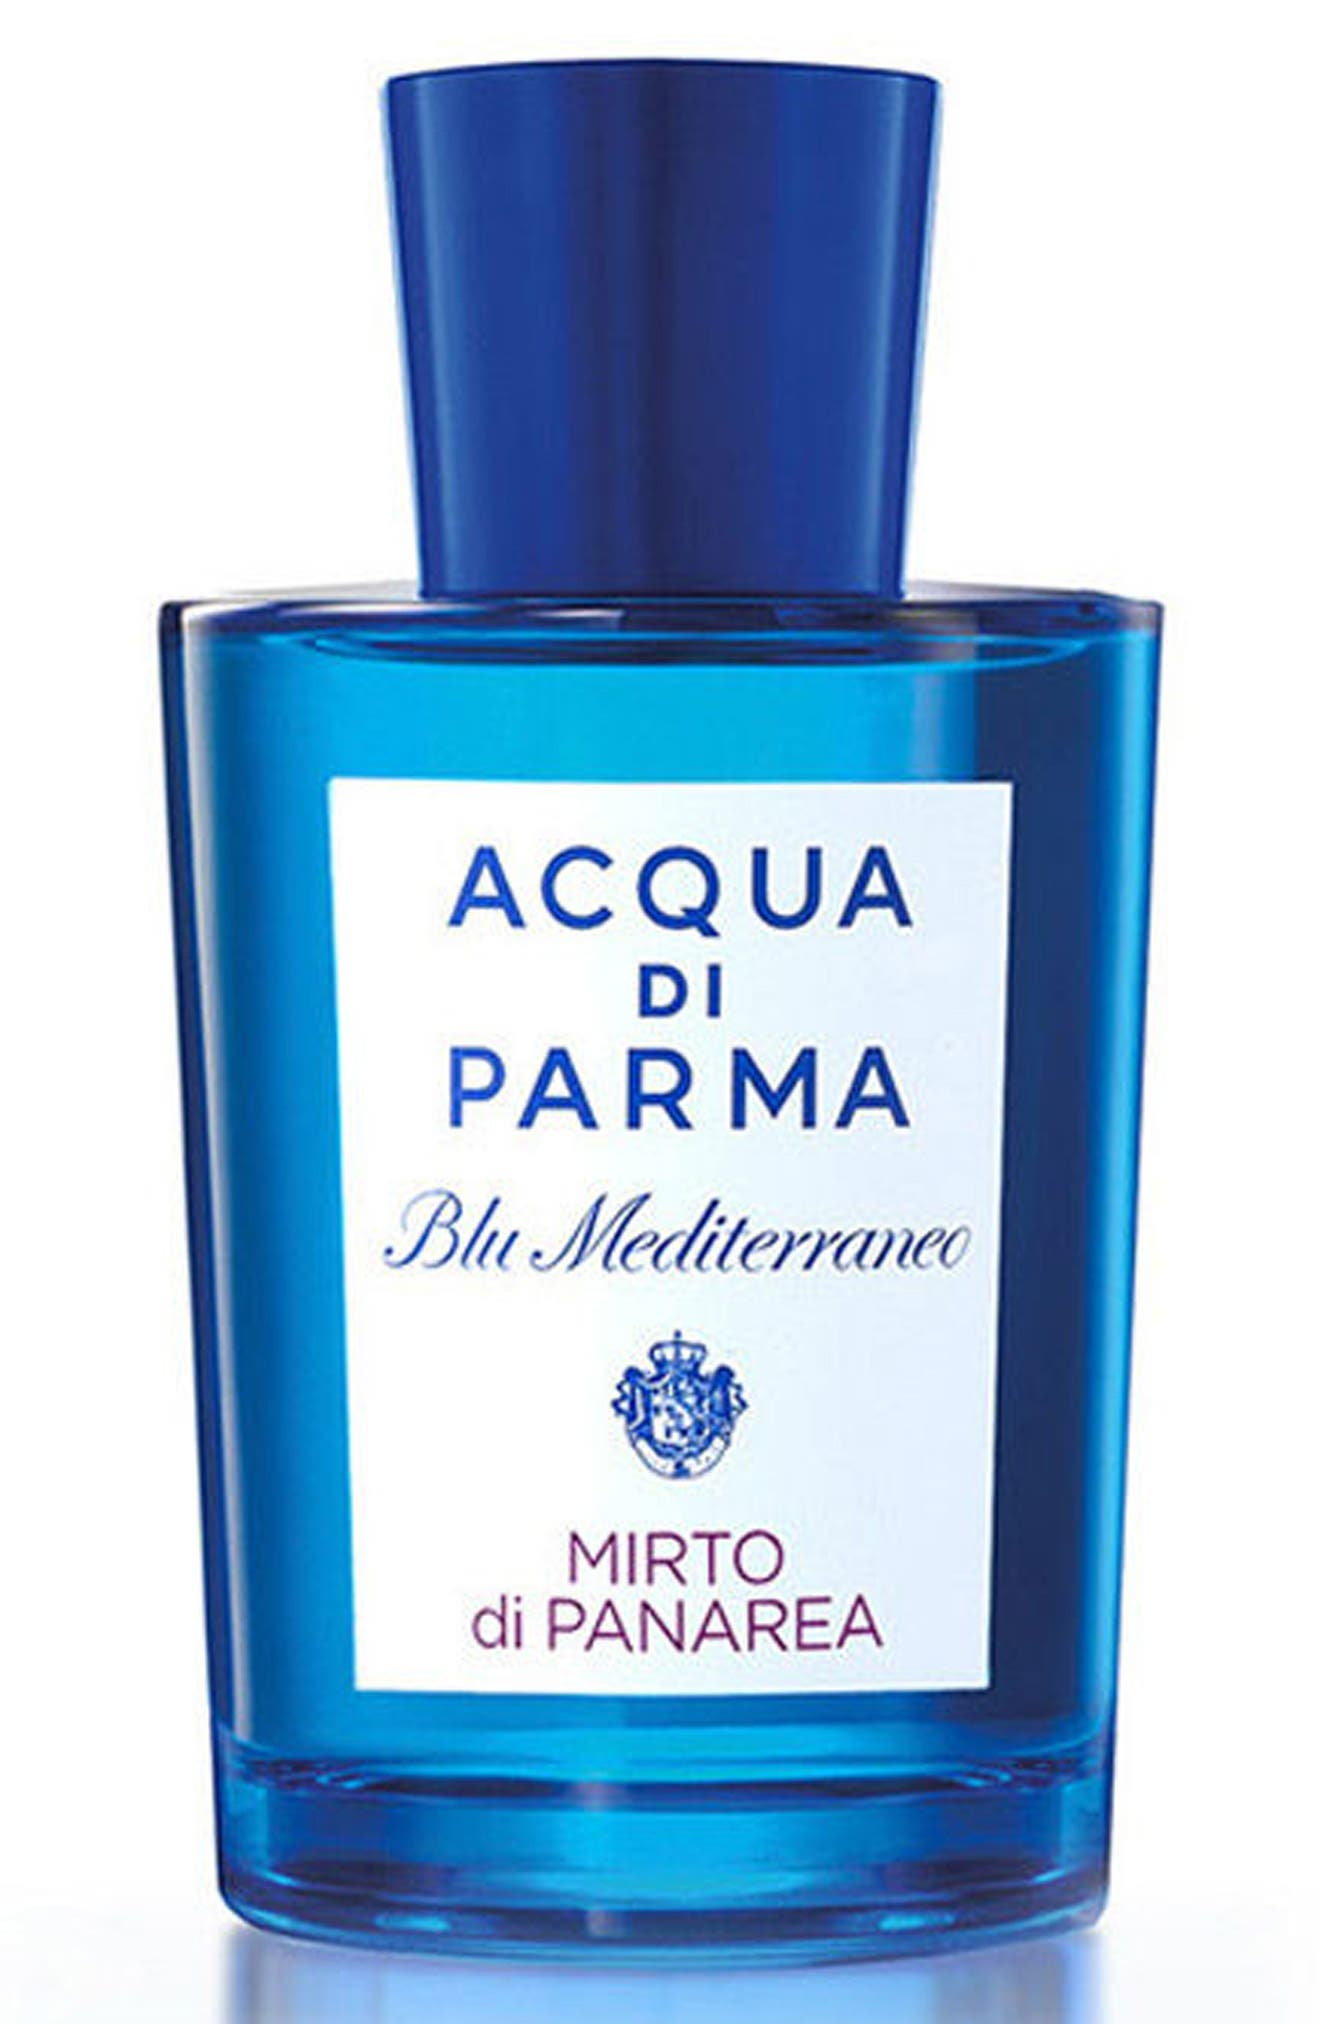 Main Image - Acqua di Parma 'Blu Mediterraneo' Mirto di Panarea Eau de Toilette Spray